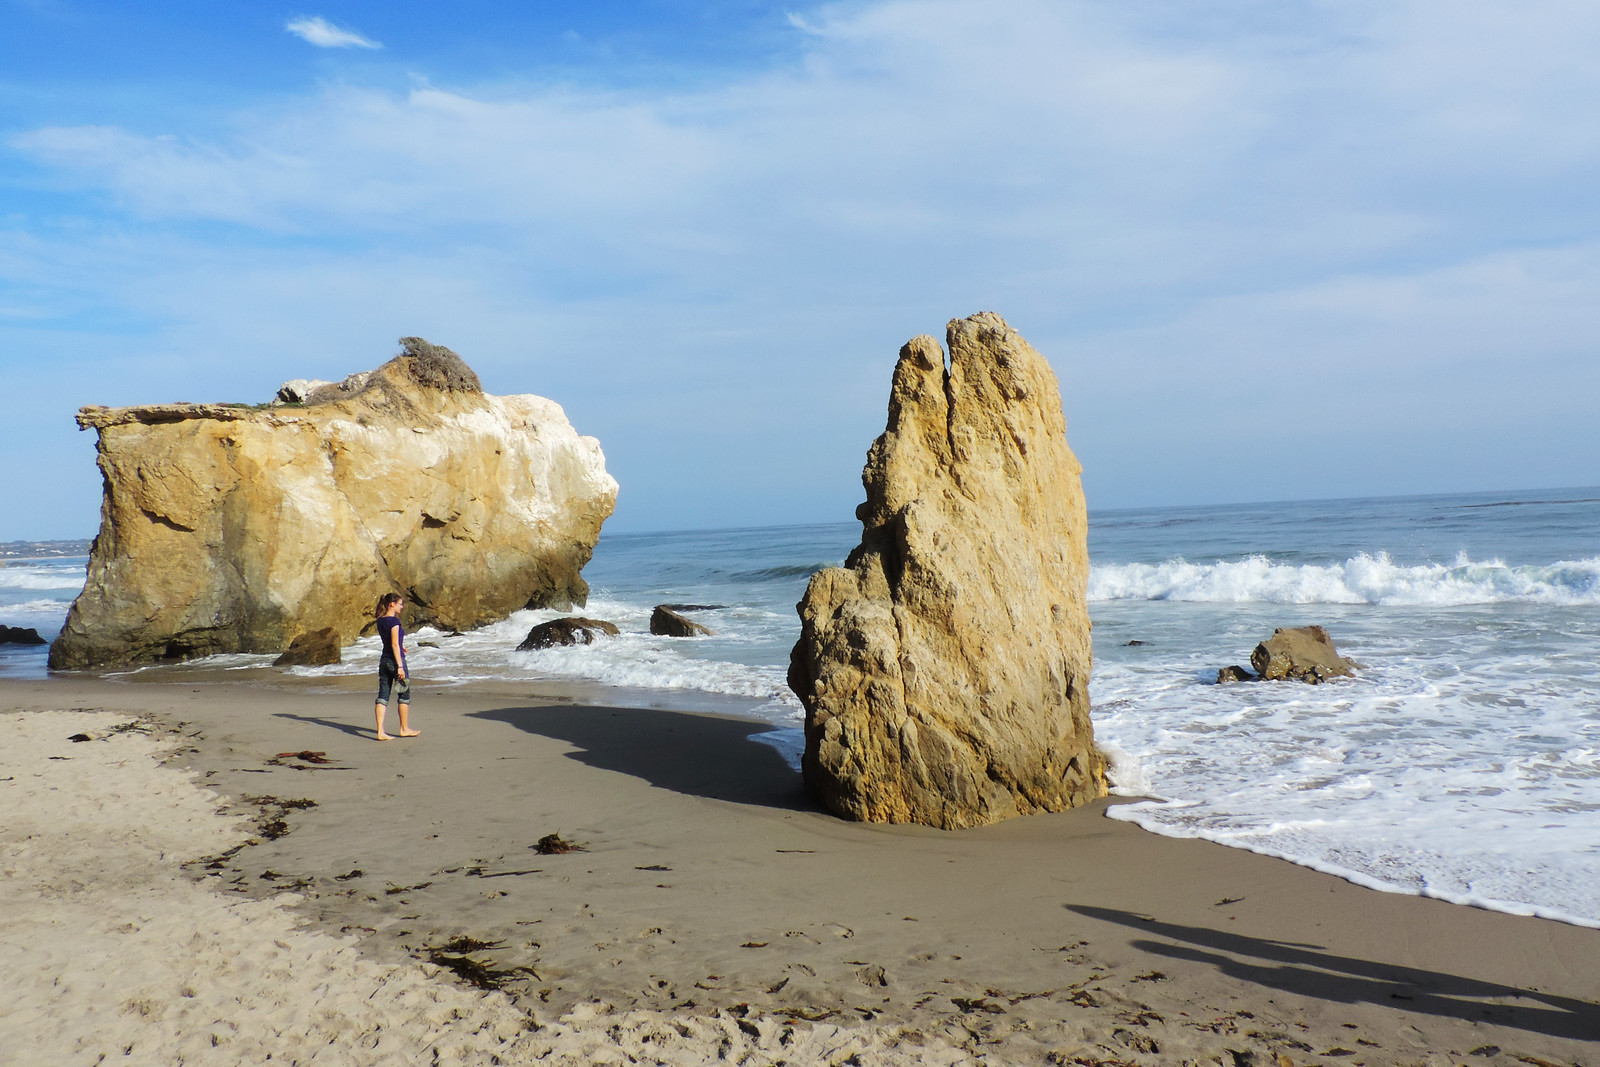 El Matador Beach, Malibu, California, USA